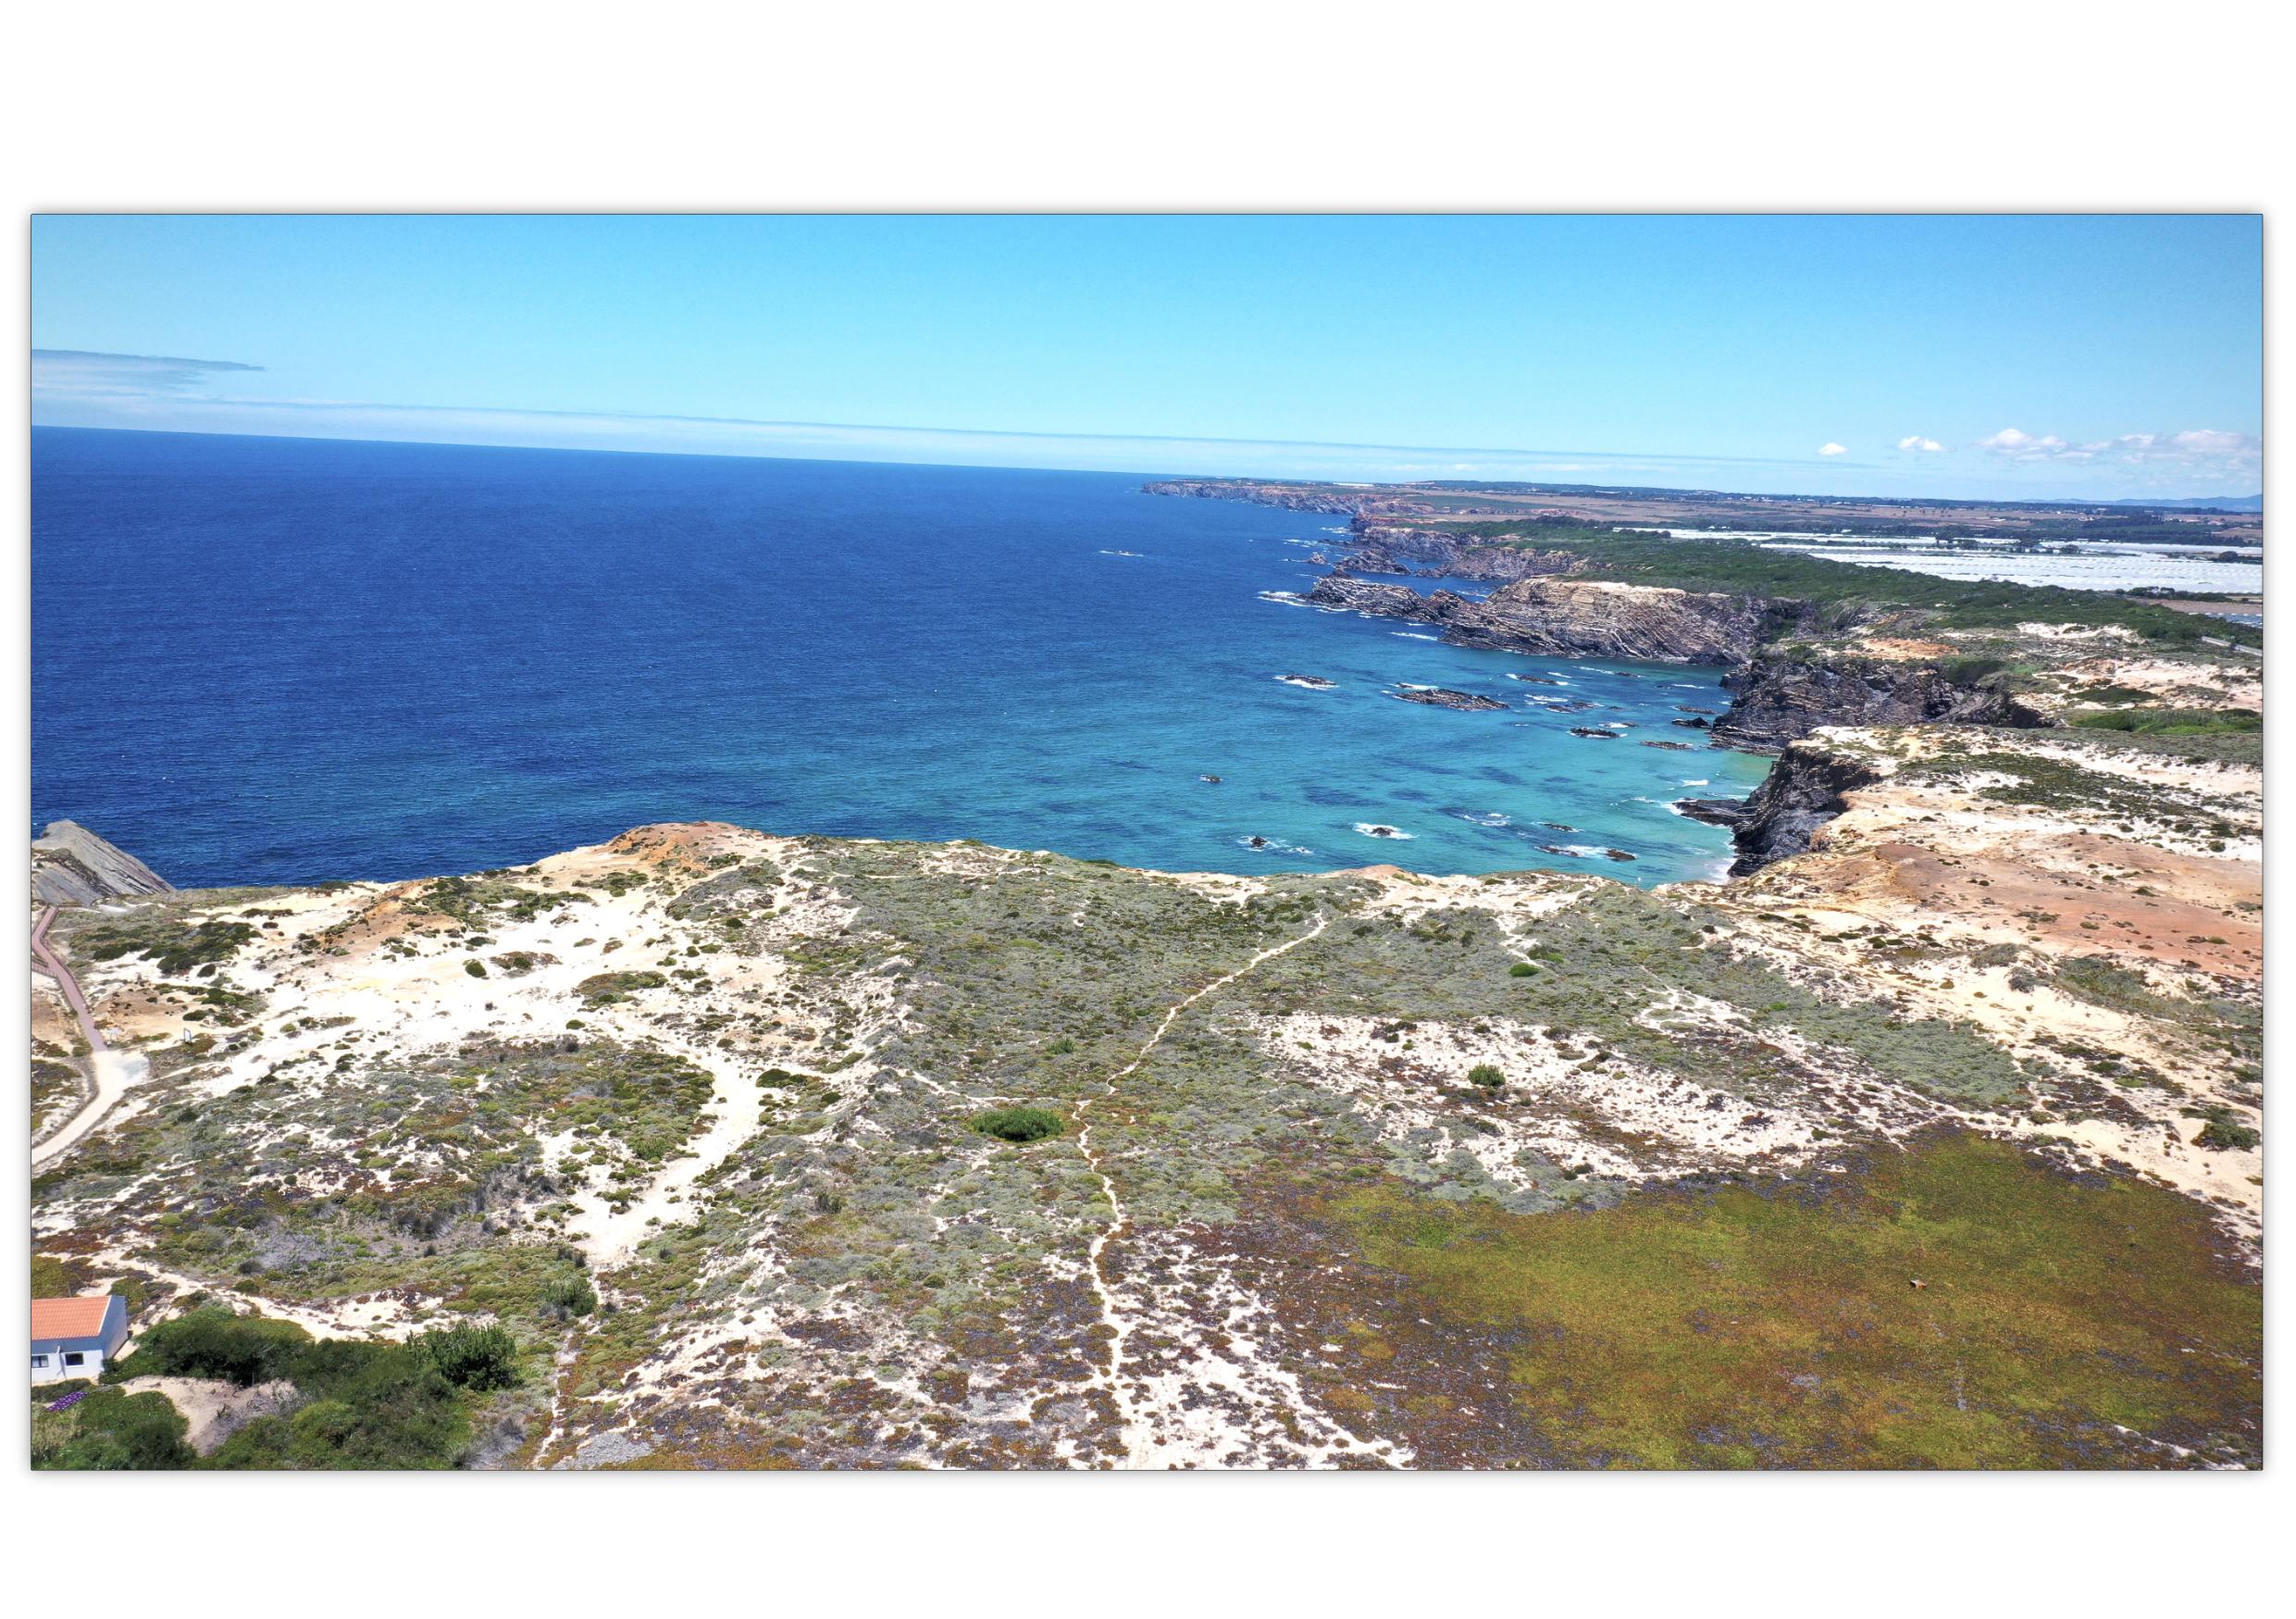 IPBOX_Drone Photo